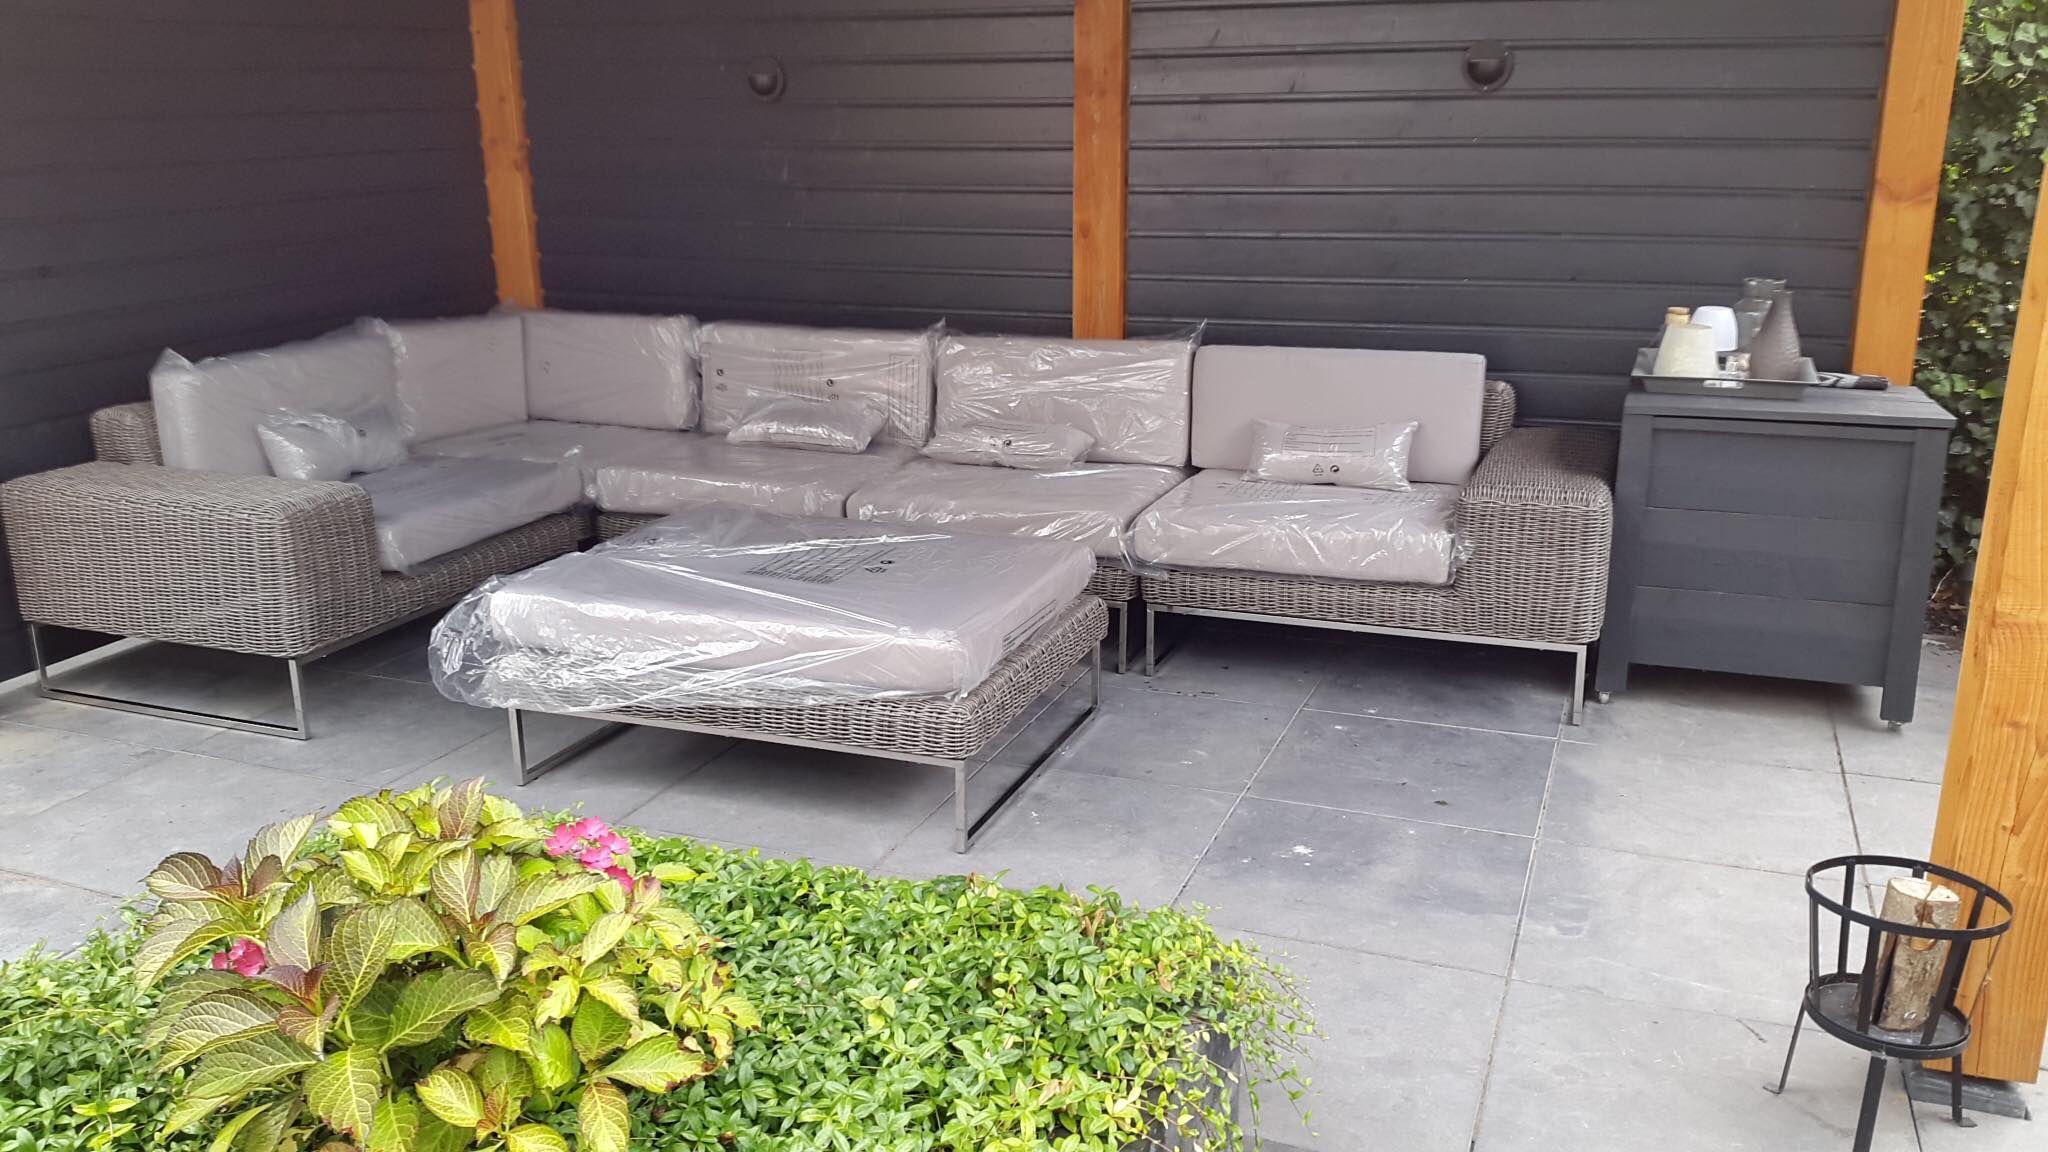 Lounge hoekbank lineo rondwicker grijs design by arbrini. deze